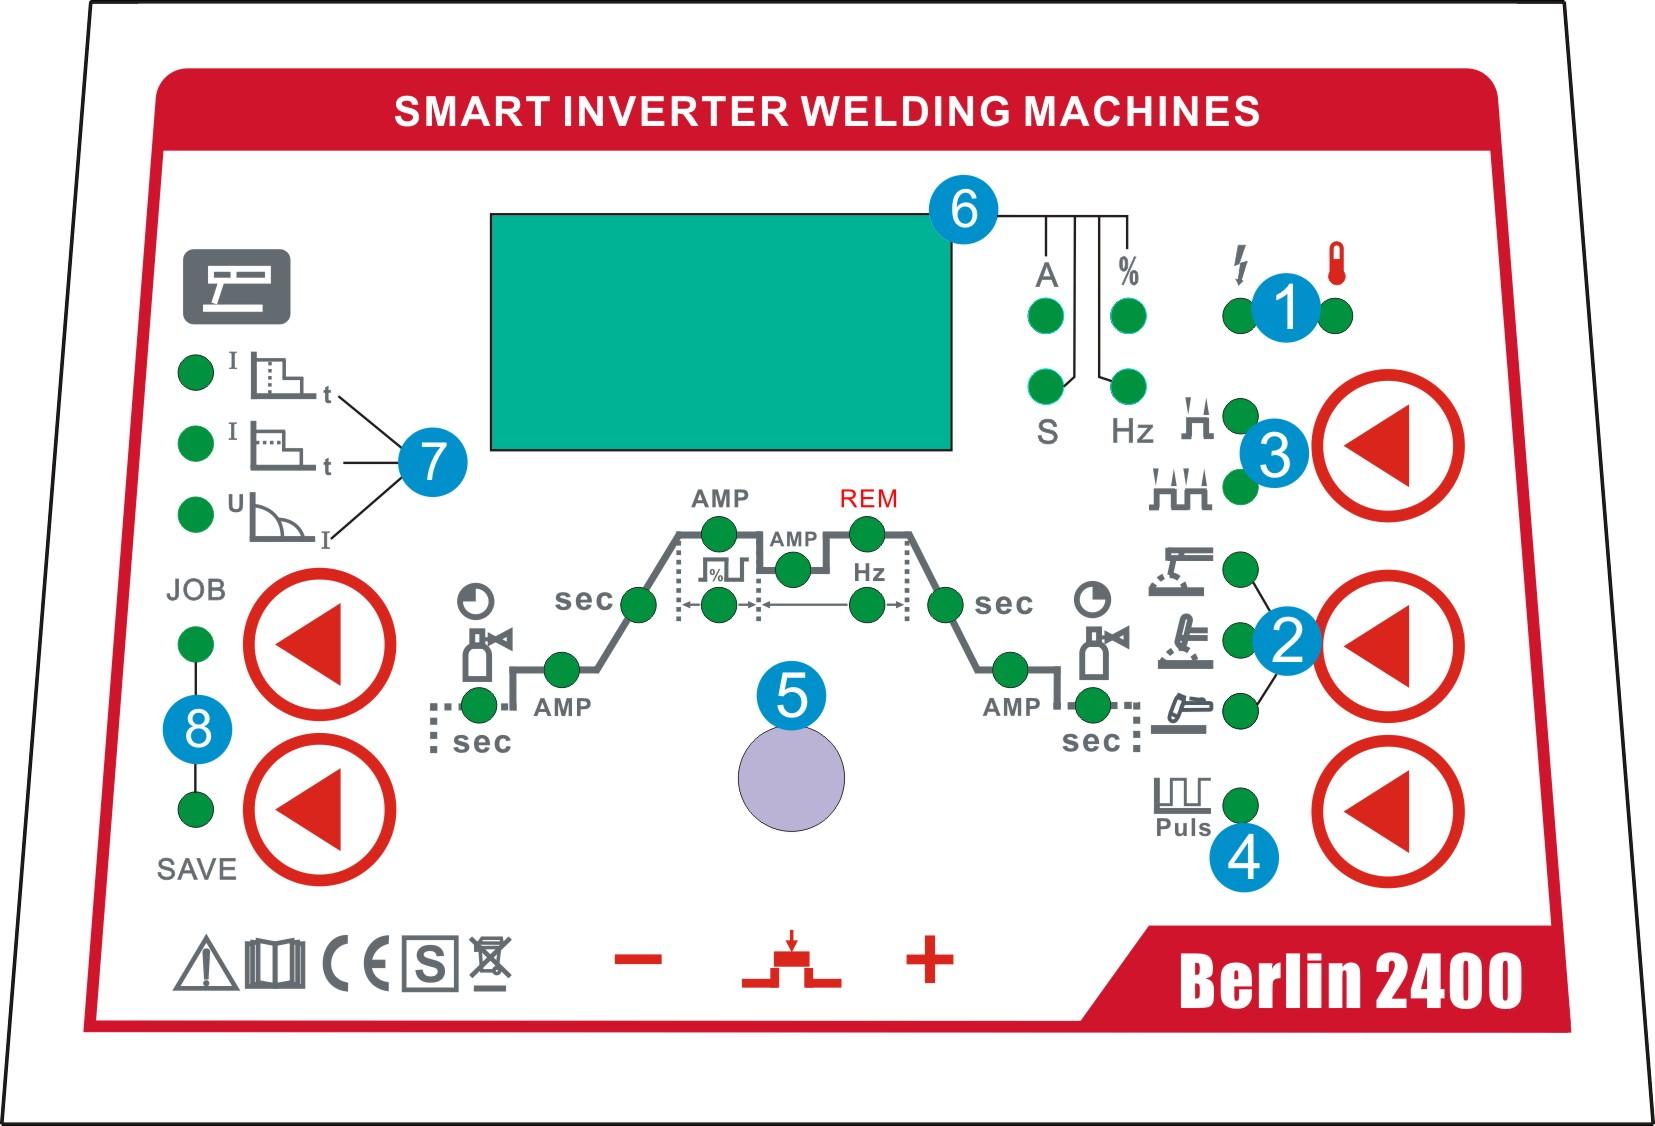 Ovládací panel SIWM Berlin 2400 DC PLASMA